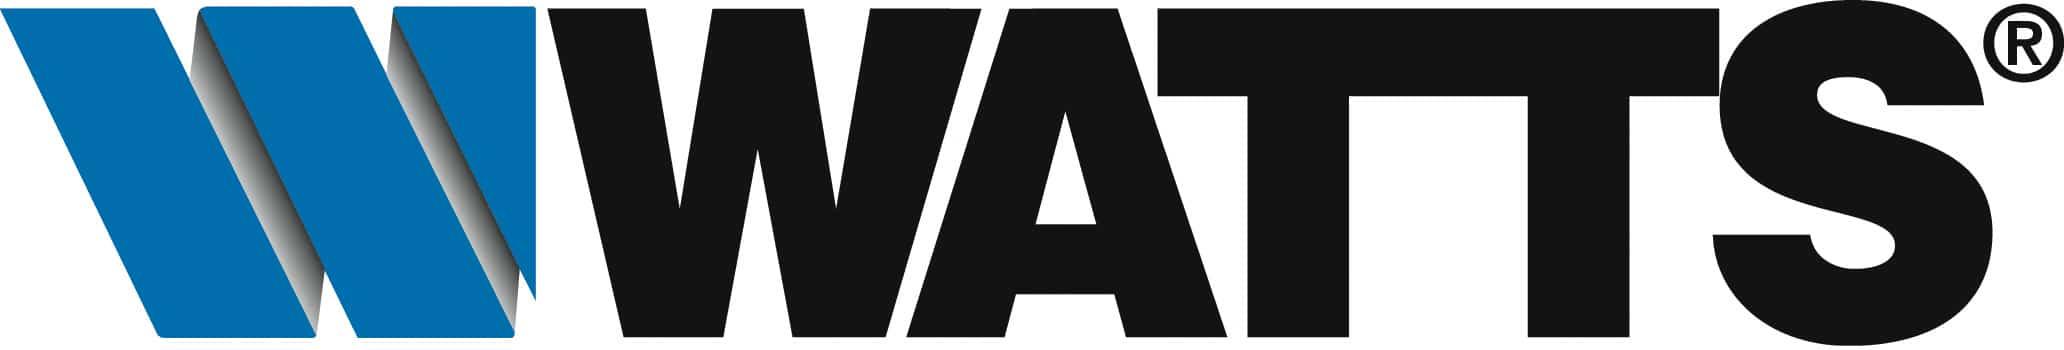 Watts Industries logo